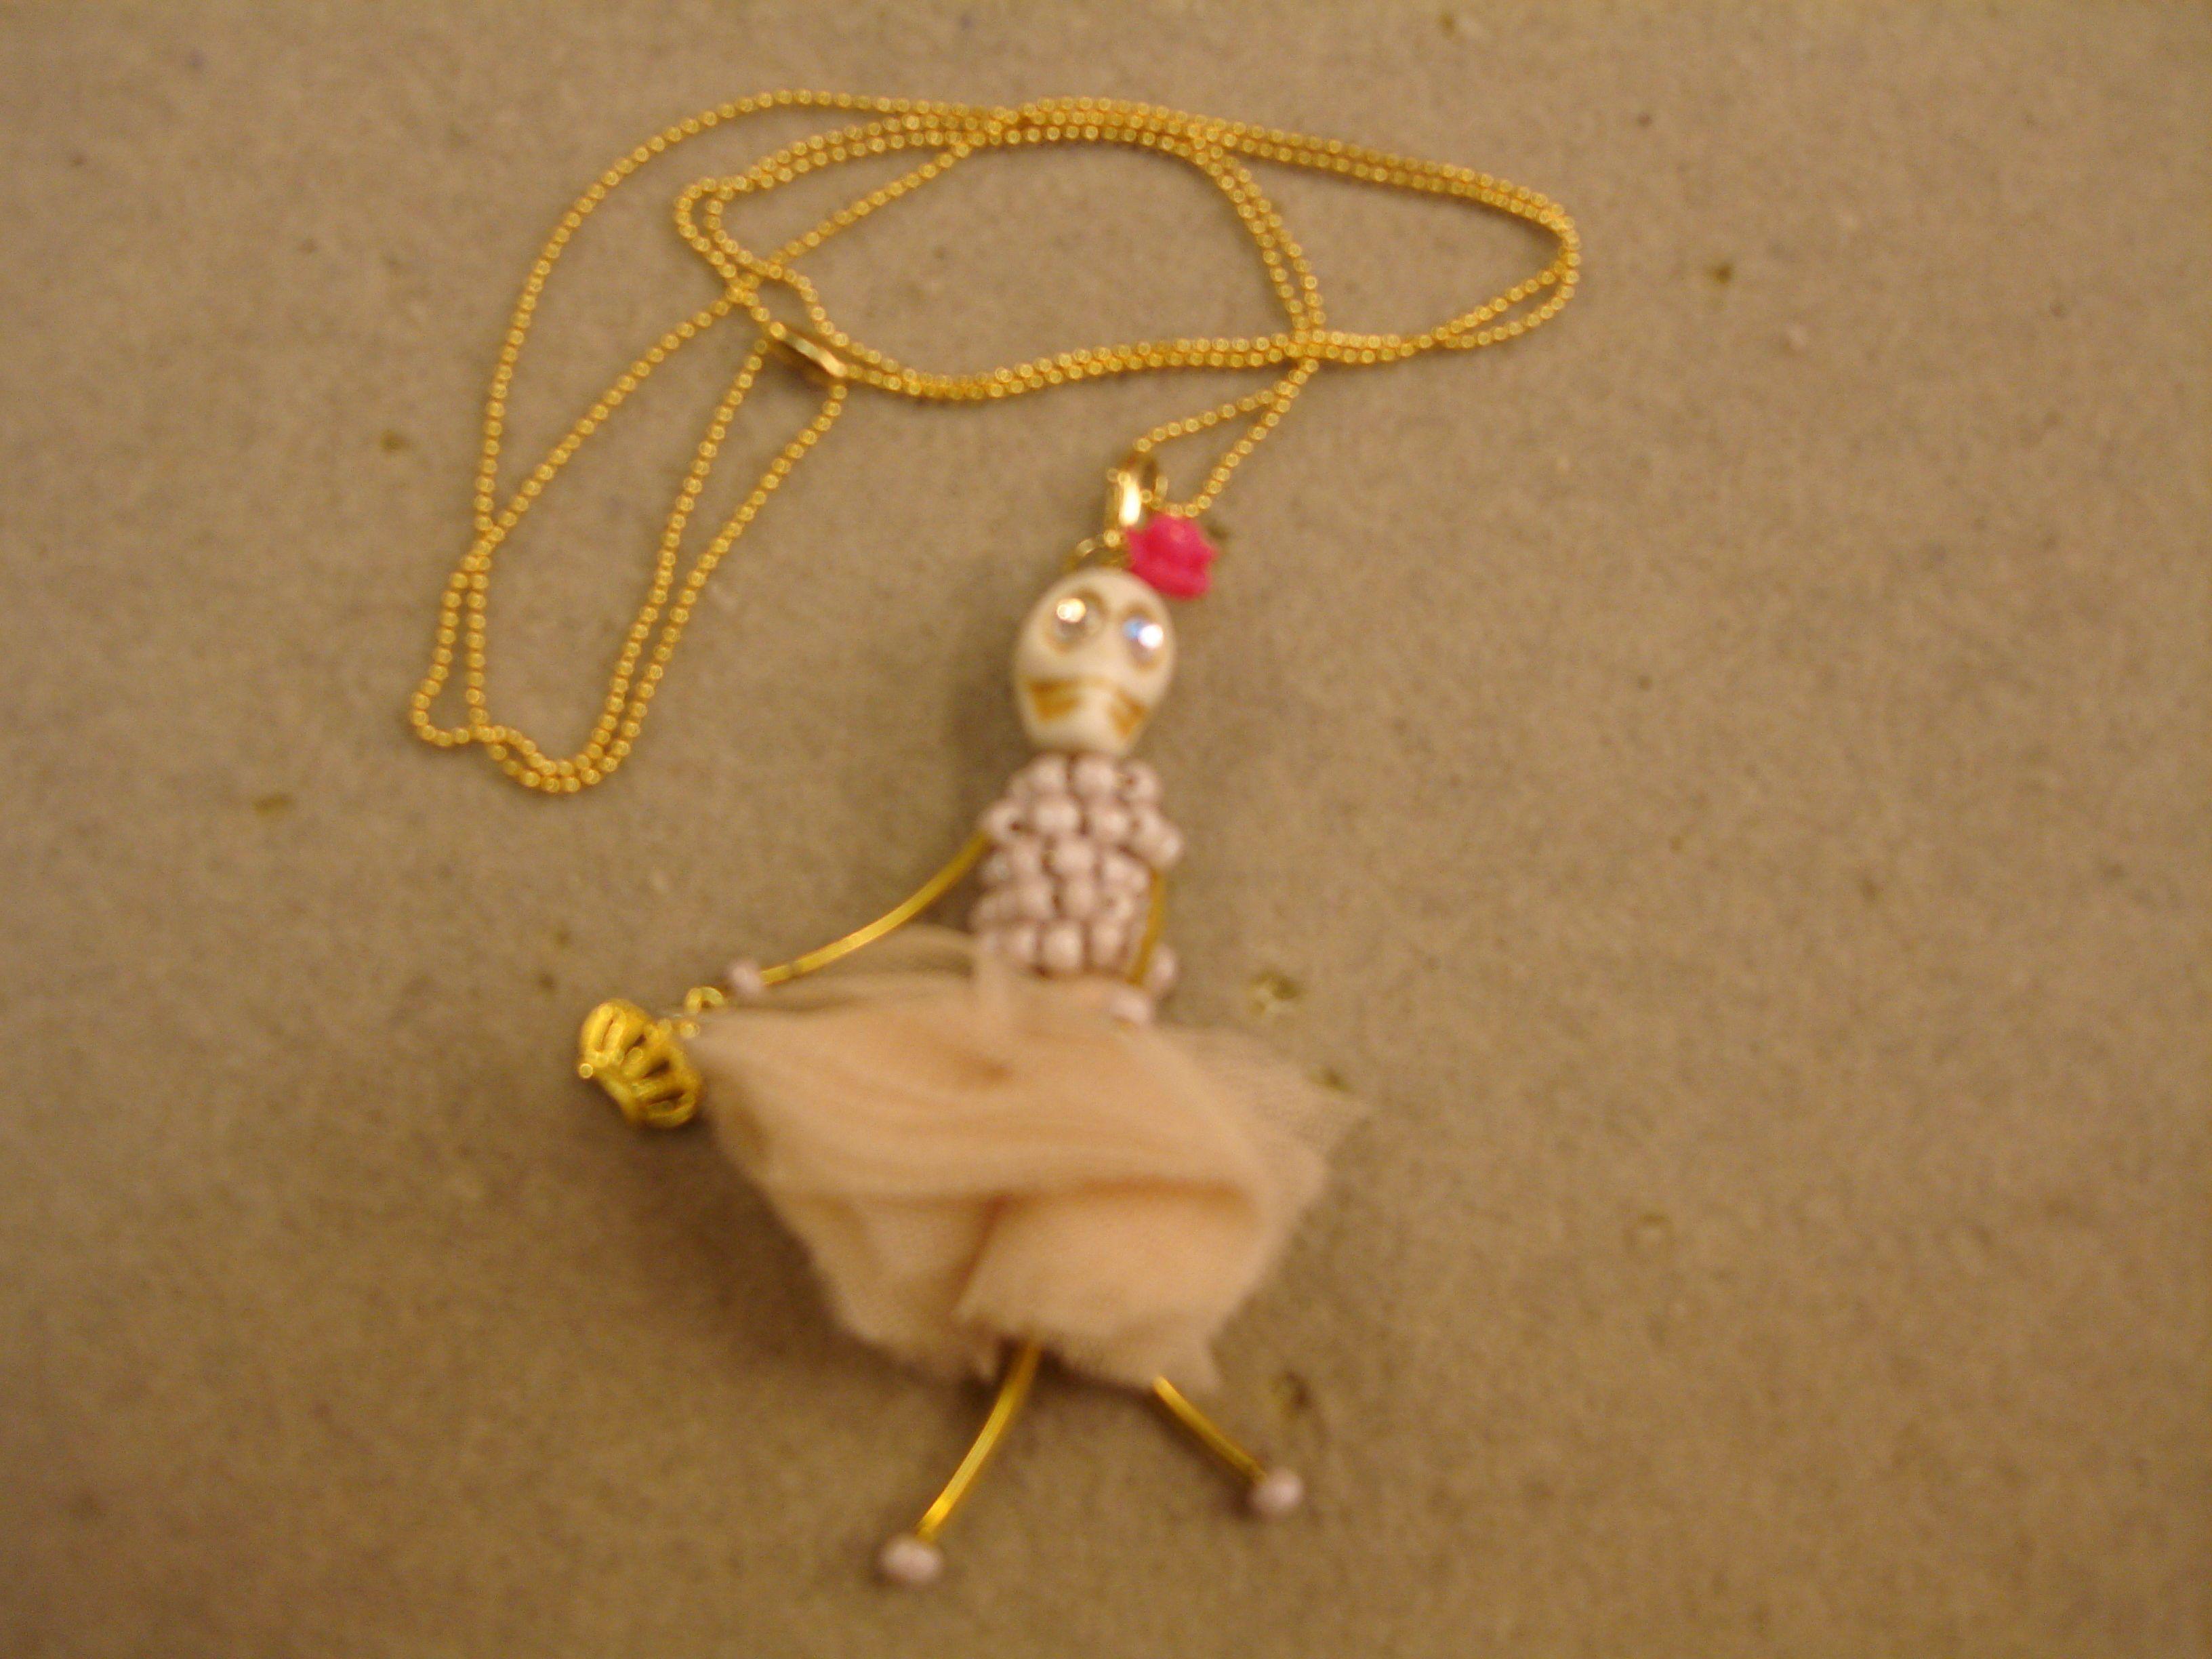 Collar Carrie Bradshaw